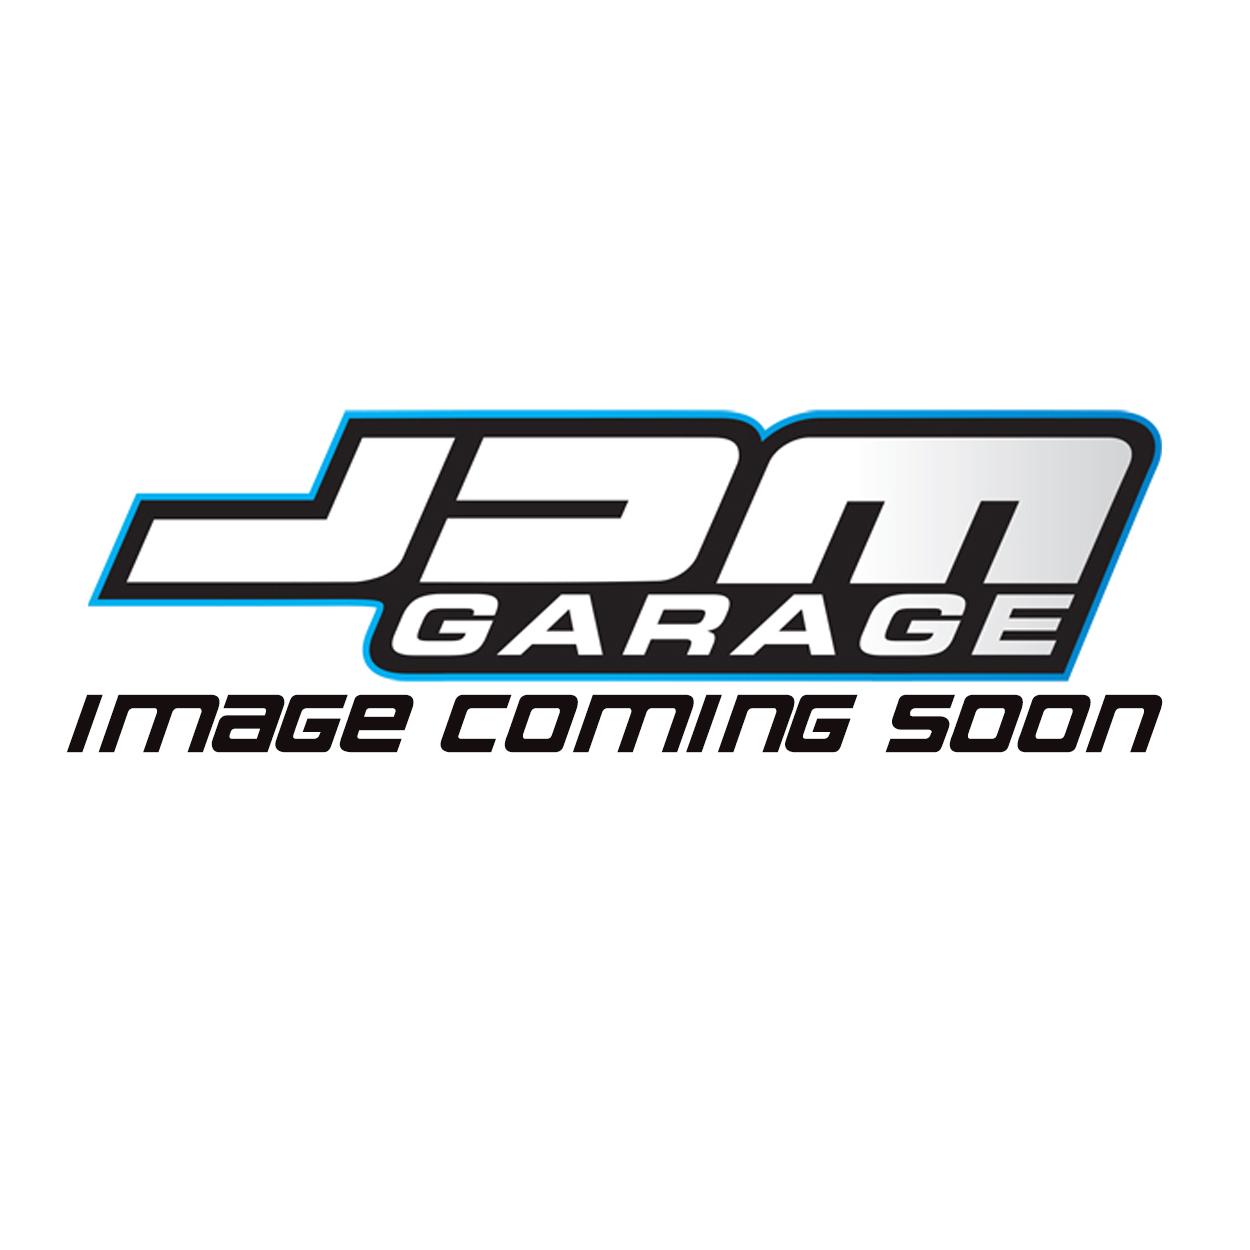 Genuine Toyota 1JZ-GTE Non-VVTI / 2JZ-VVTI Water Pump Fits Toyota Supra MK4 JZA80 16100-49847